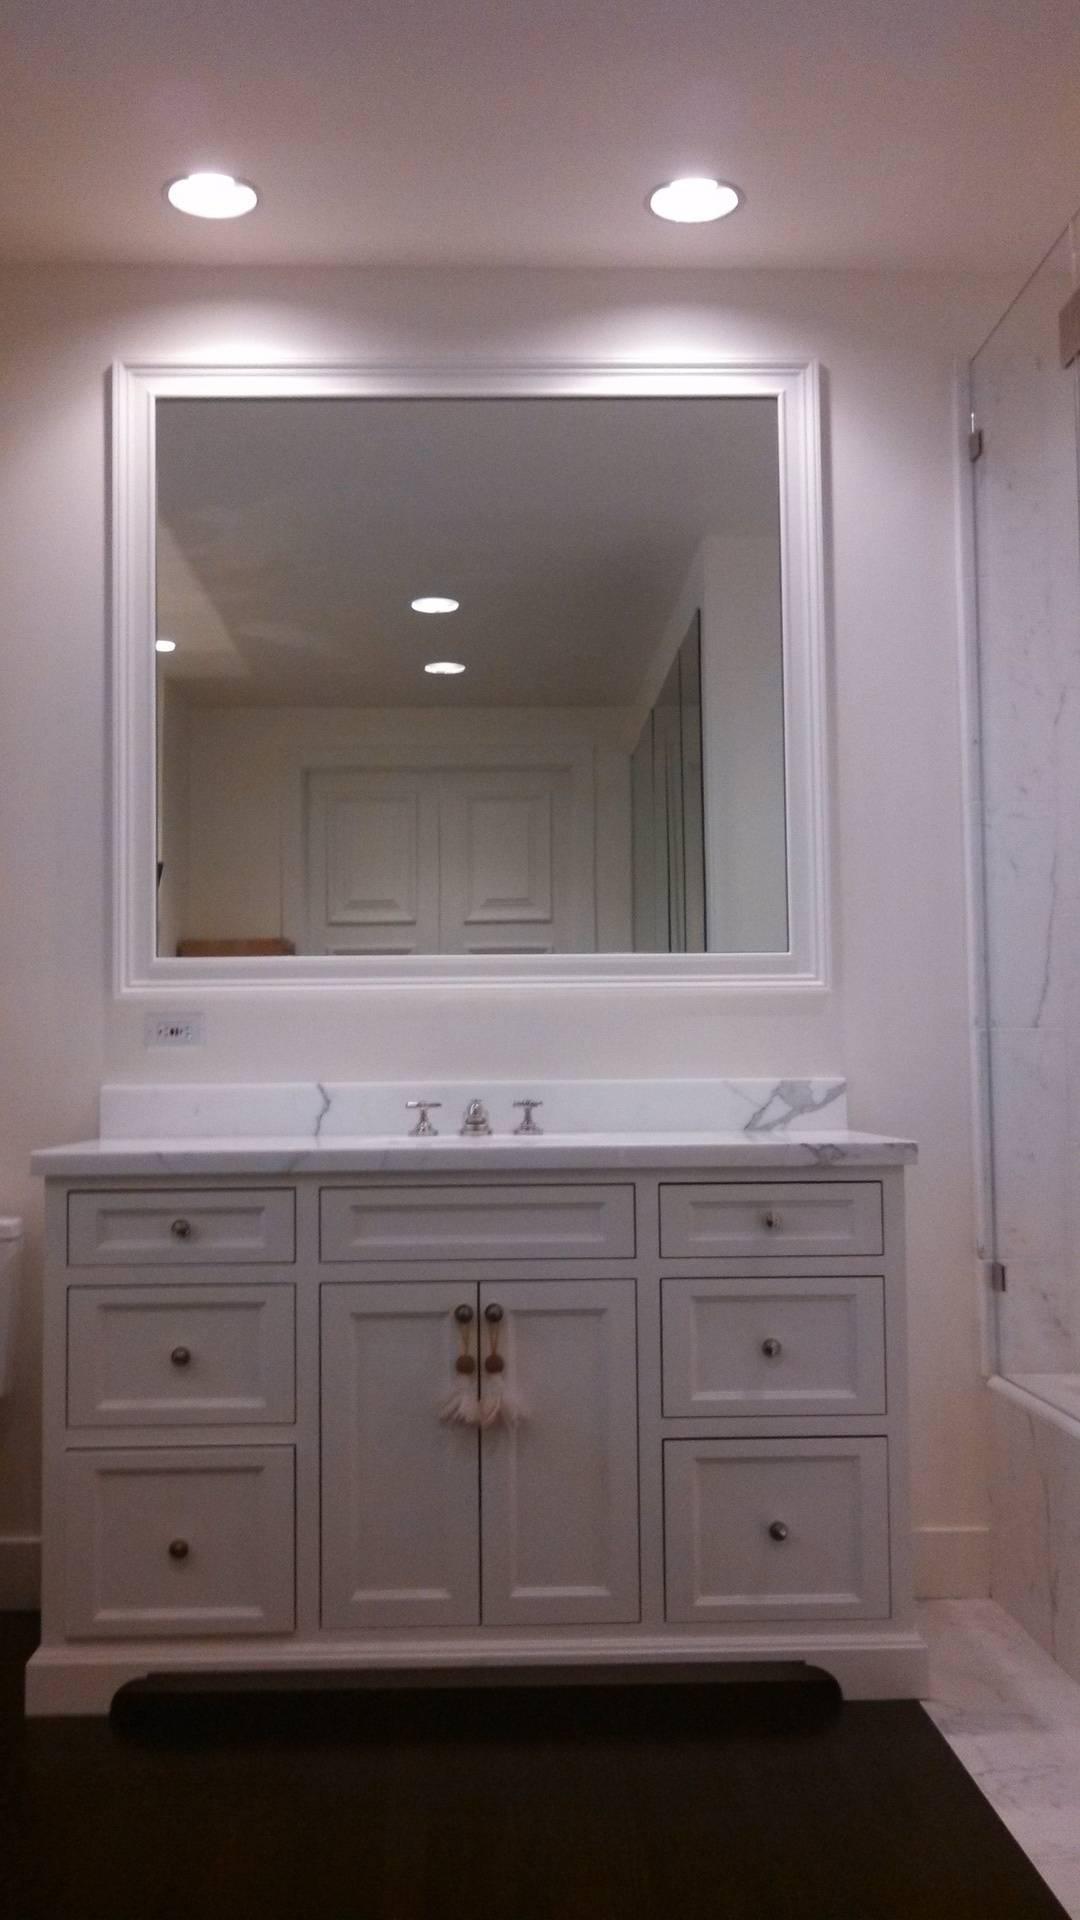 Bathroom framed mirror